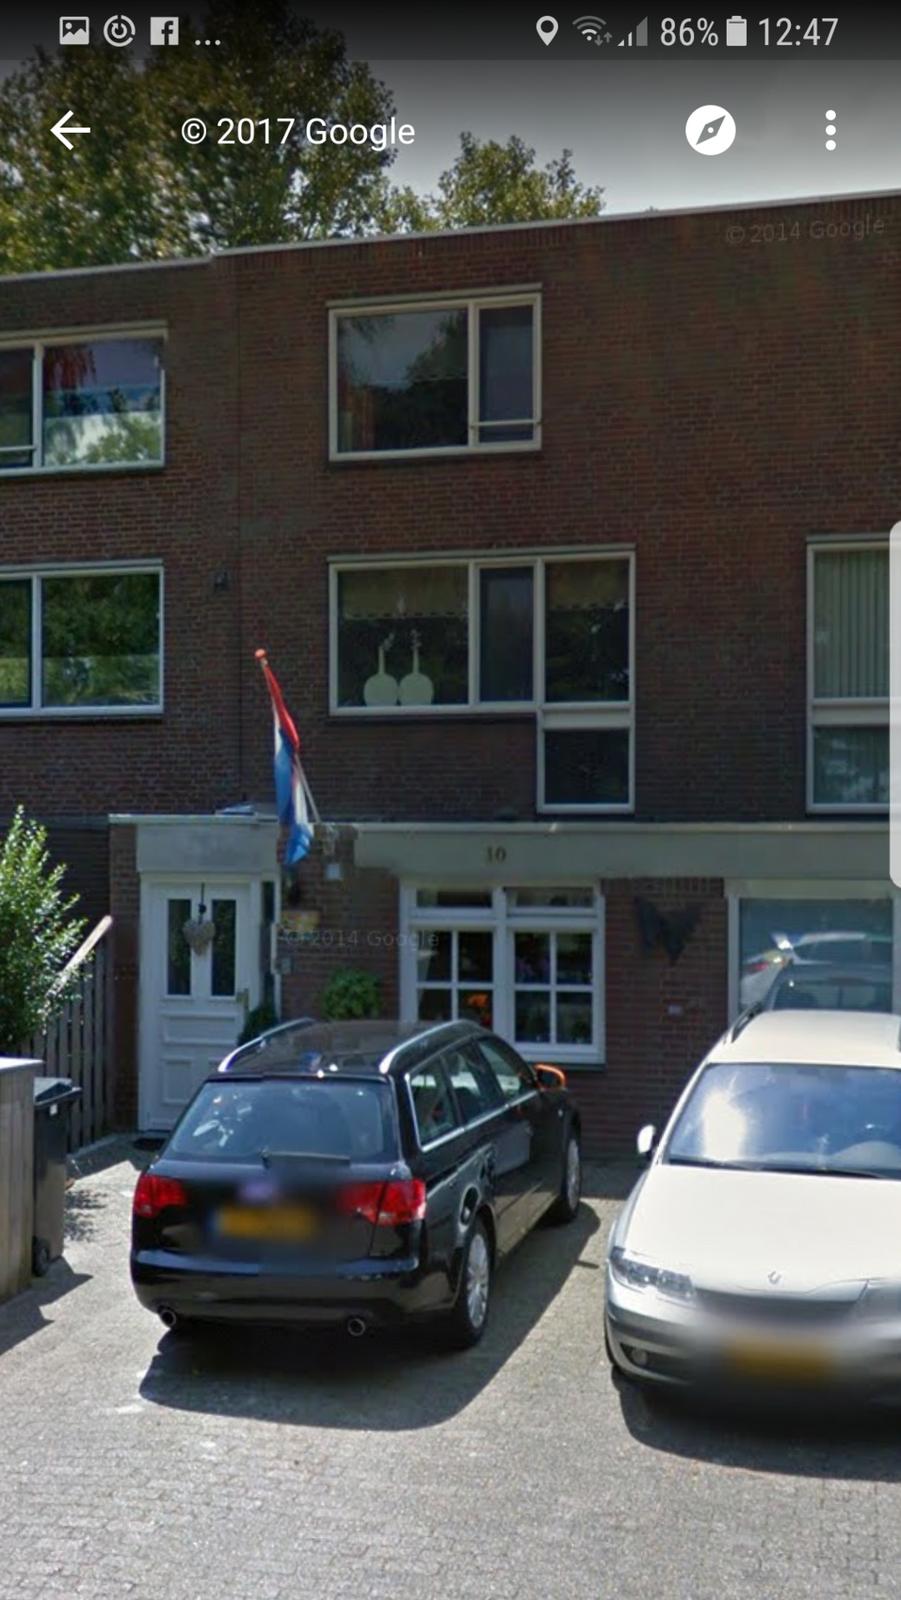 Hikspoorsstraat 10, Helmond